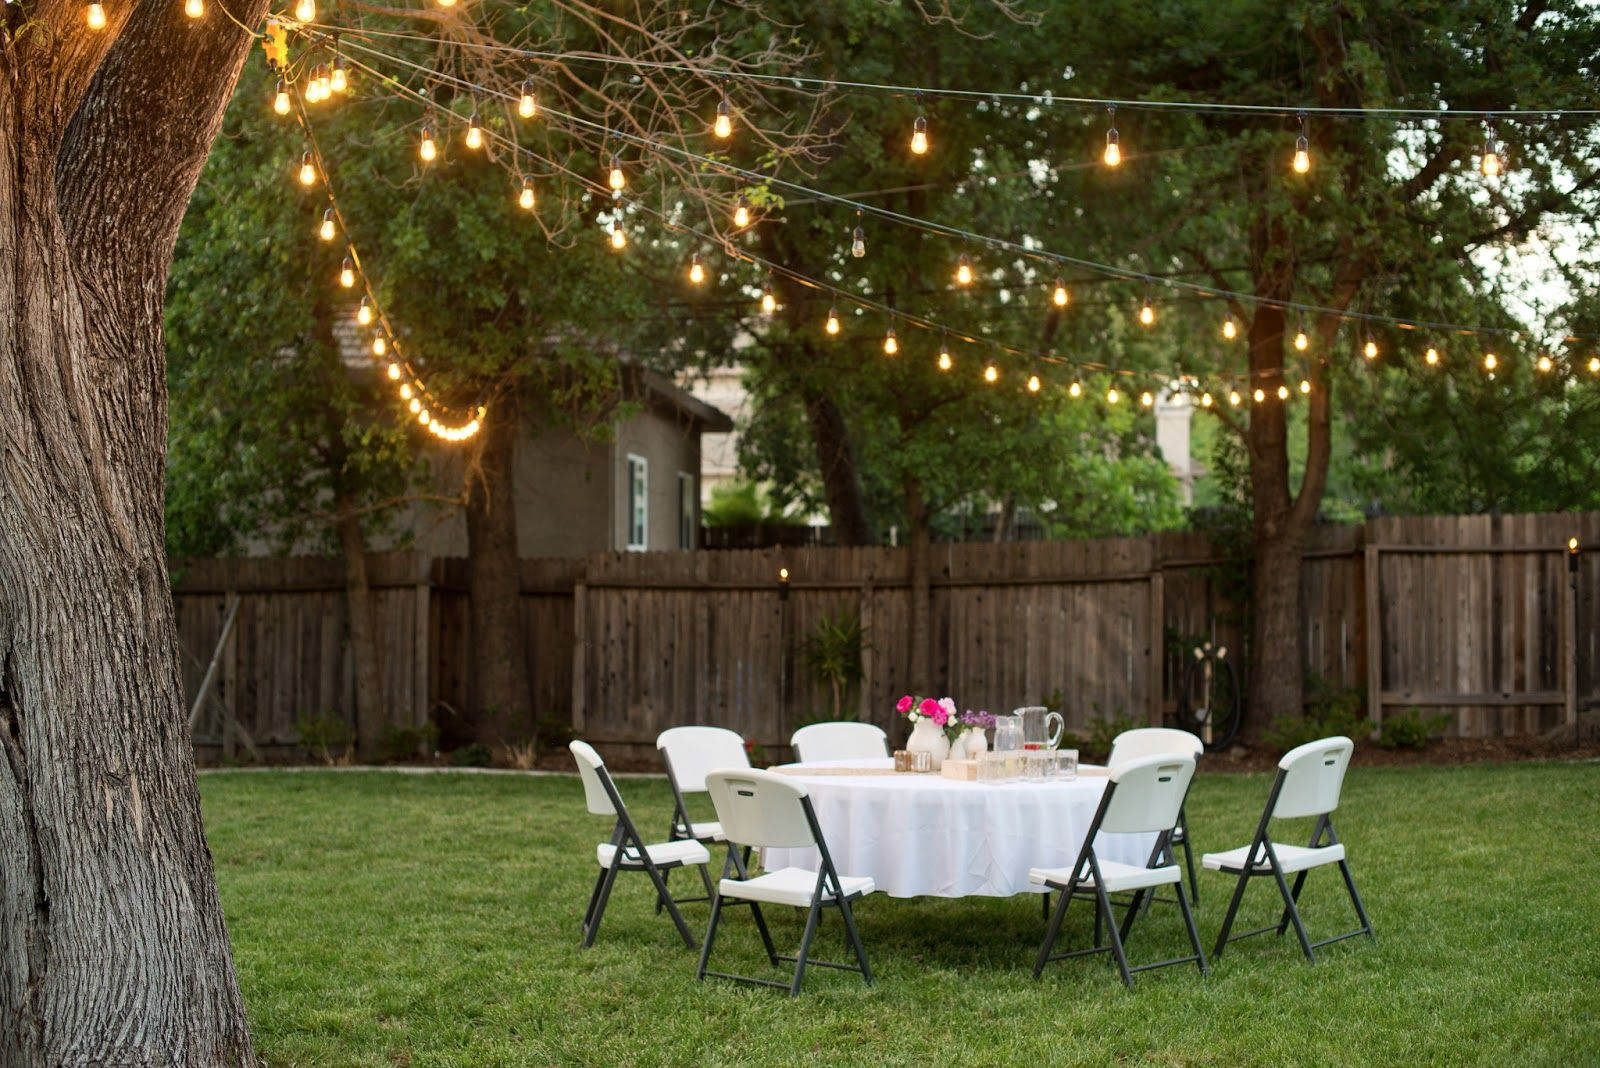 10 Quick Tips For Diy Outdoor Lighting